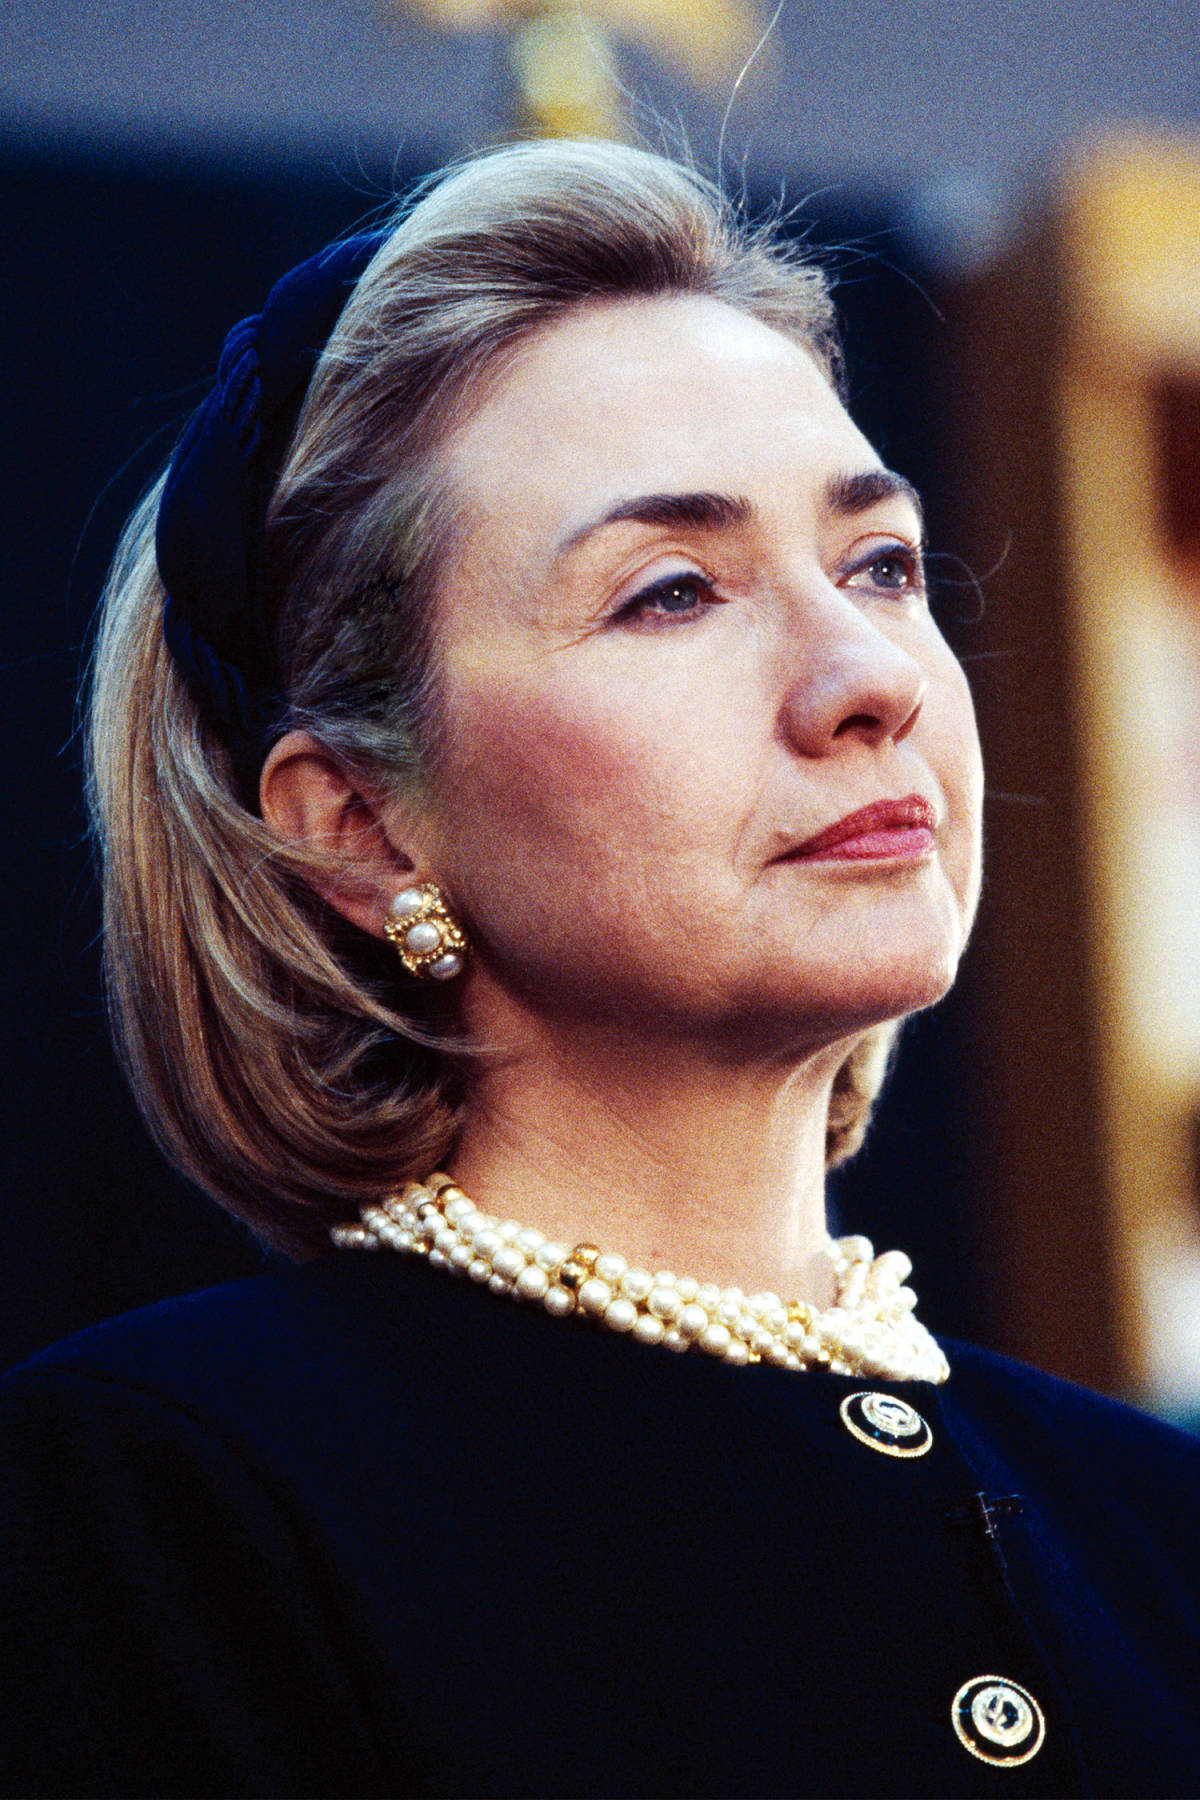 Hillary Clinton's Best Headband and Hair Moments